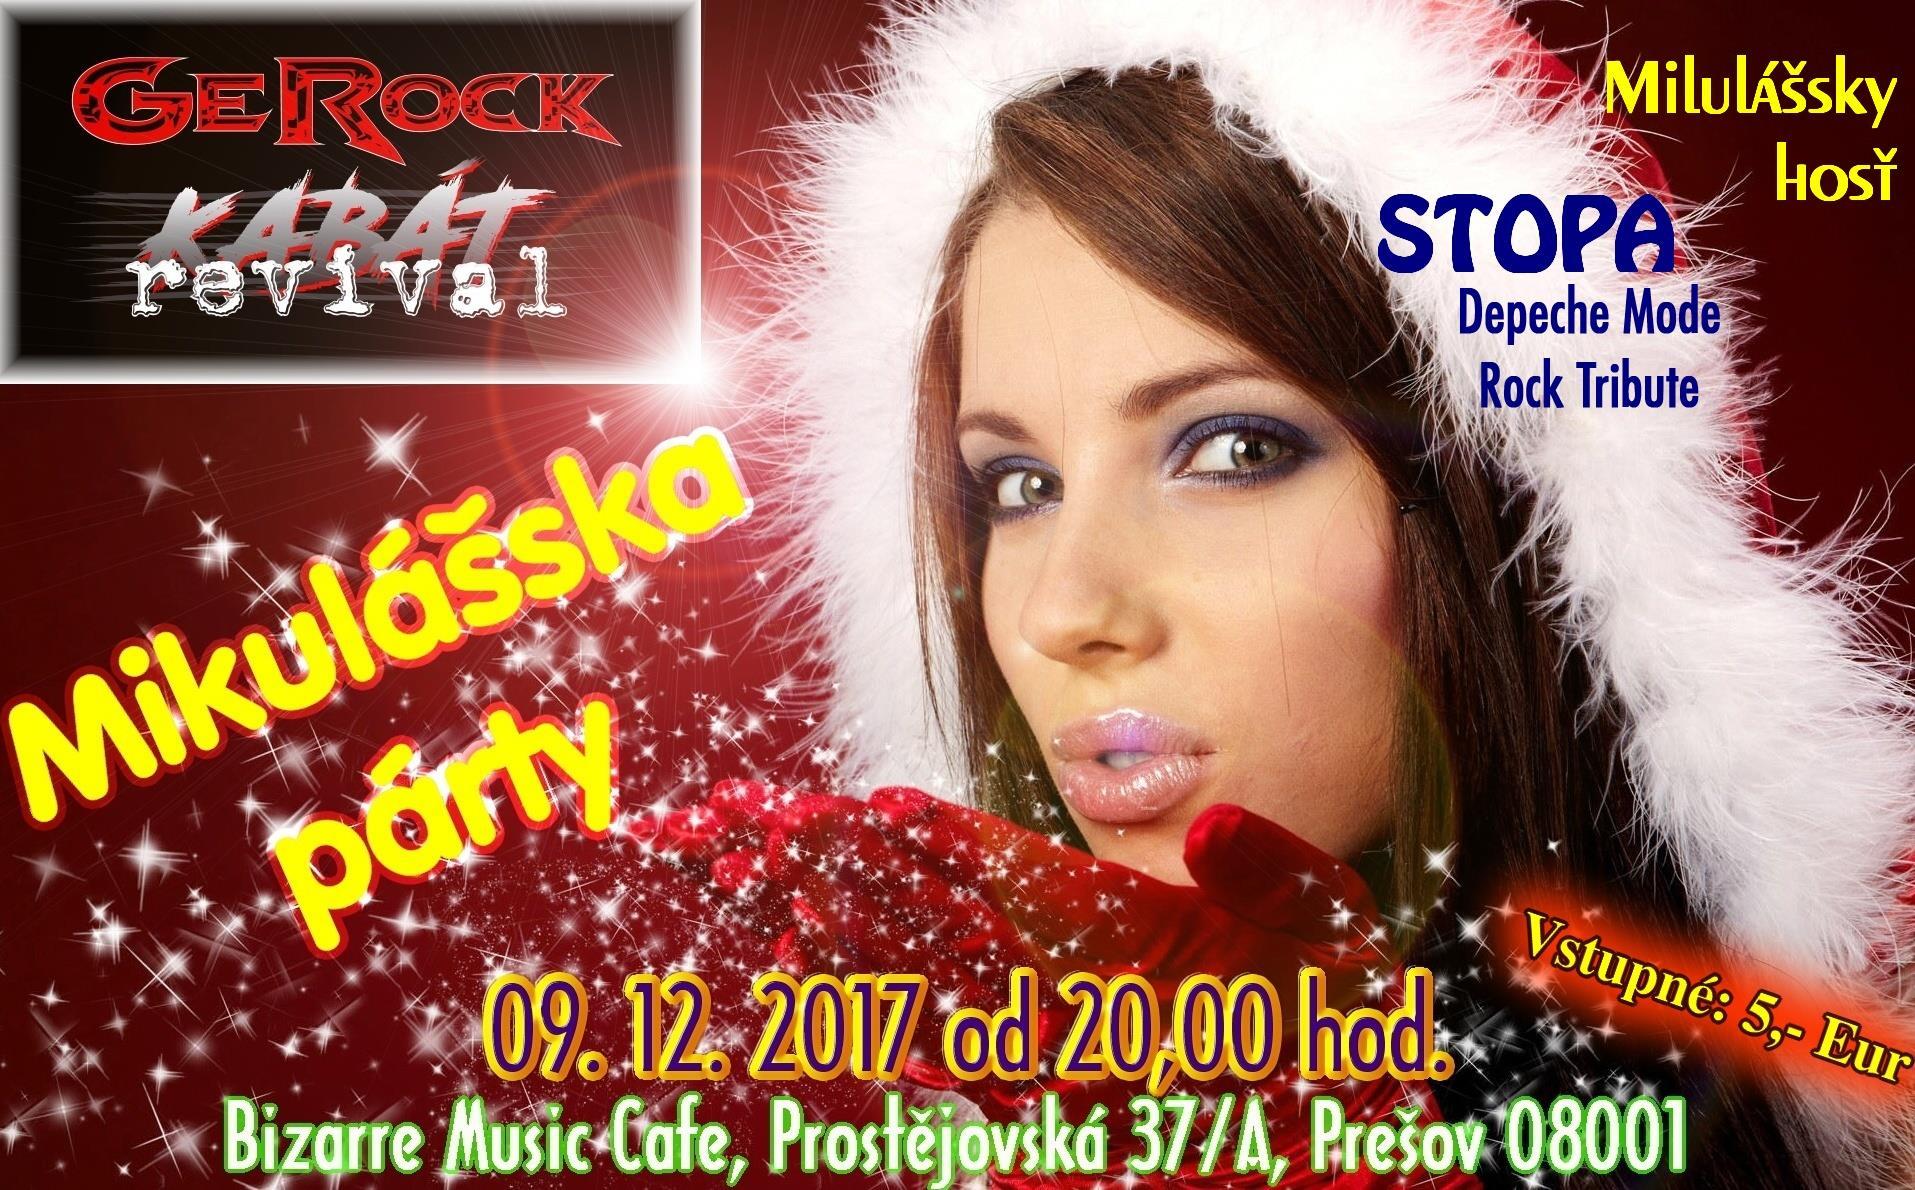 9. decembra 2017 Mikulášska párty s GeROCK Kabát revival v Prešove.